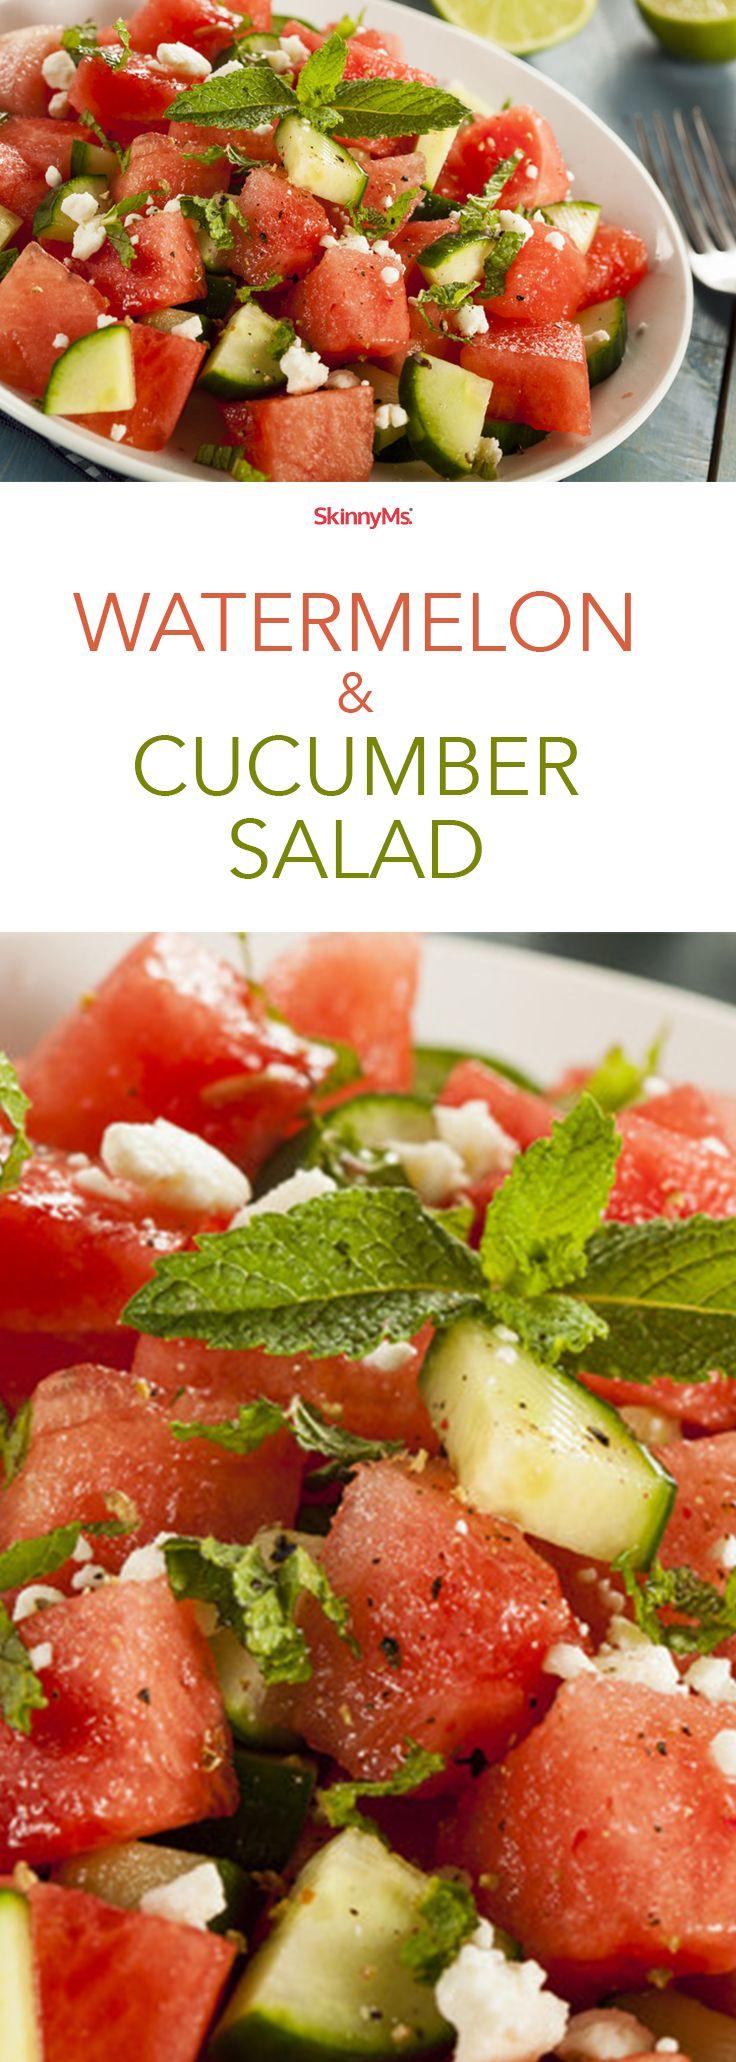 Watermelon & Cucumber Salad - watermelon, cucumber, feta, mint, honey, lime...ahhhh, so heavenly & delightful.  Only 134 calories per serving!